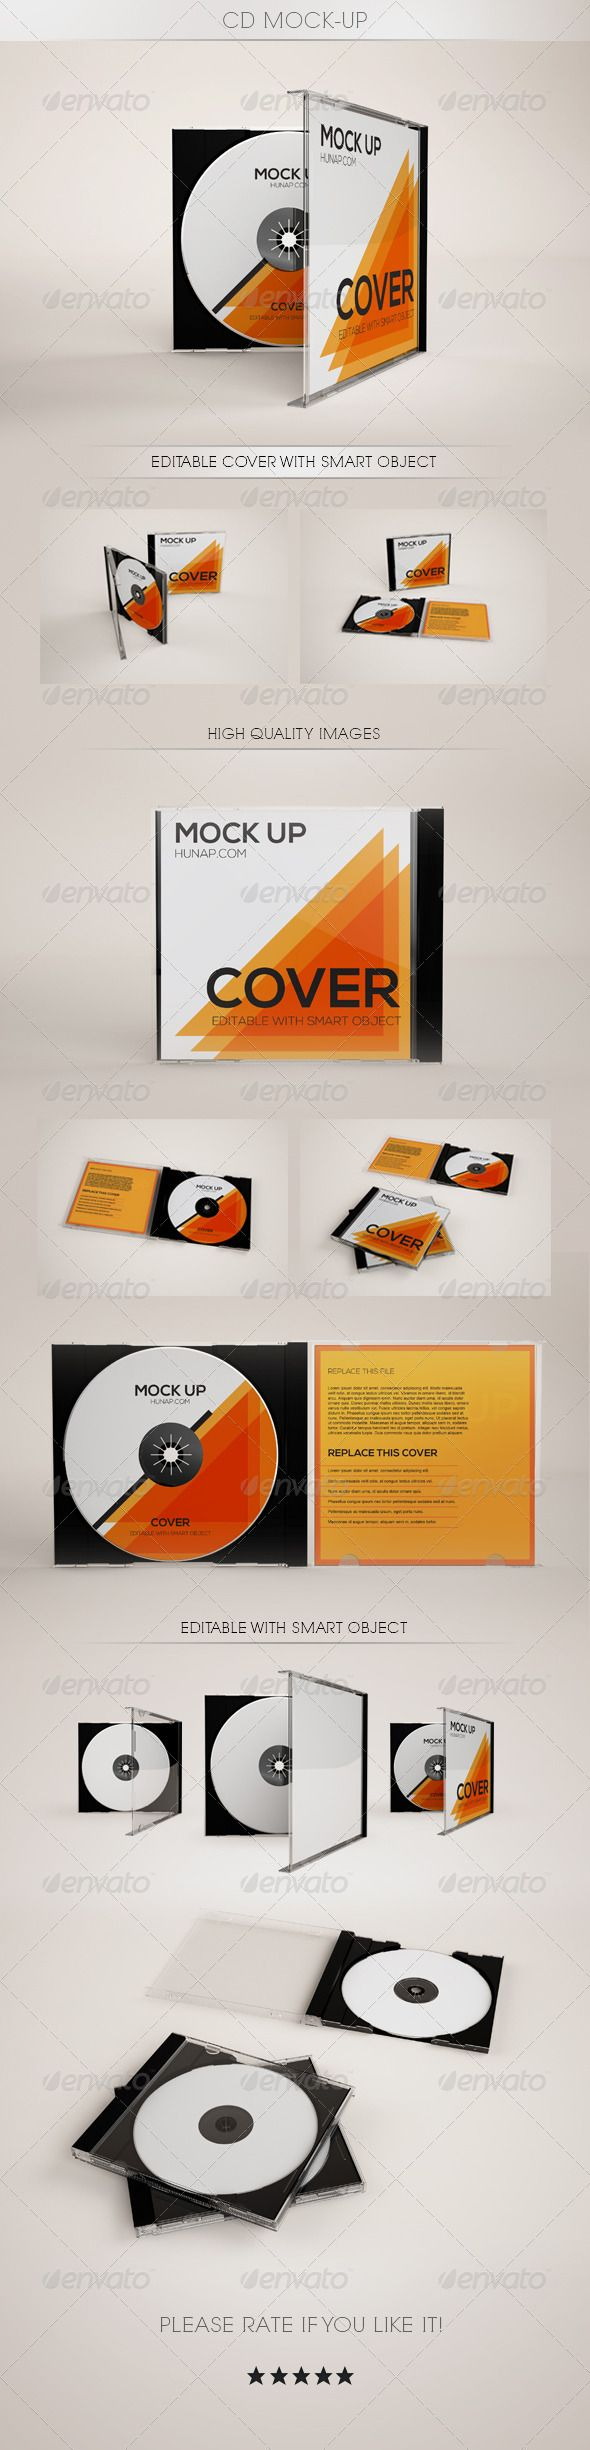 CD Mock-Up - Discs Packaging